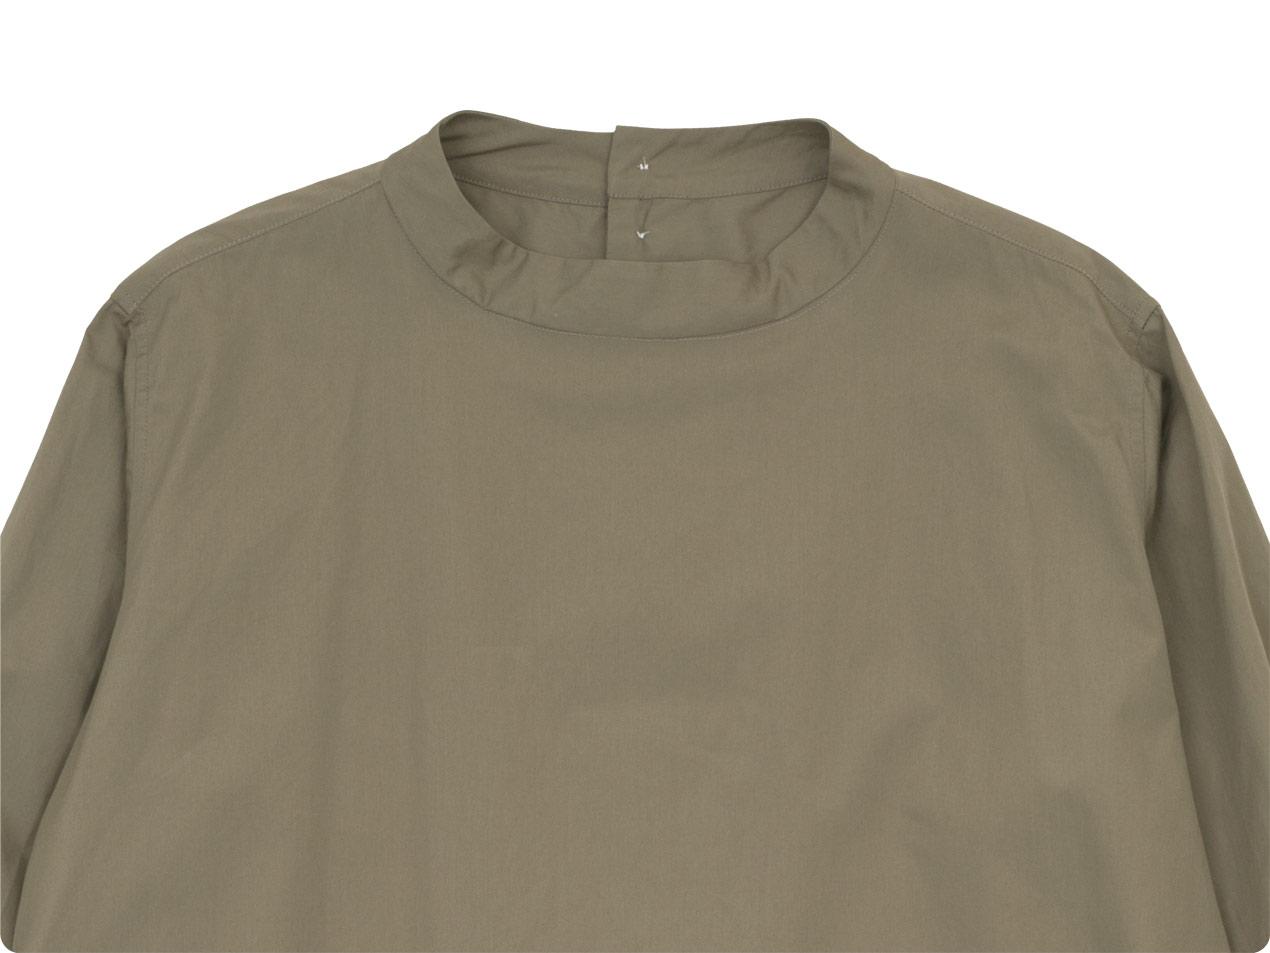 TOUJOURS Back Button Long Shirt 【MM32PS01】